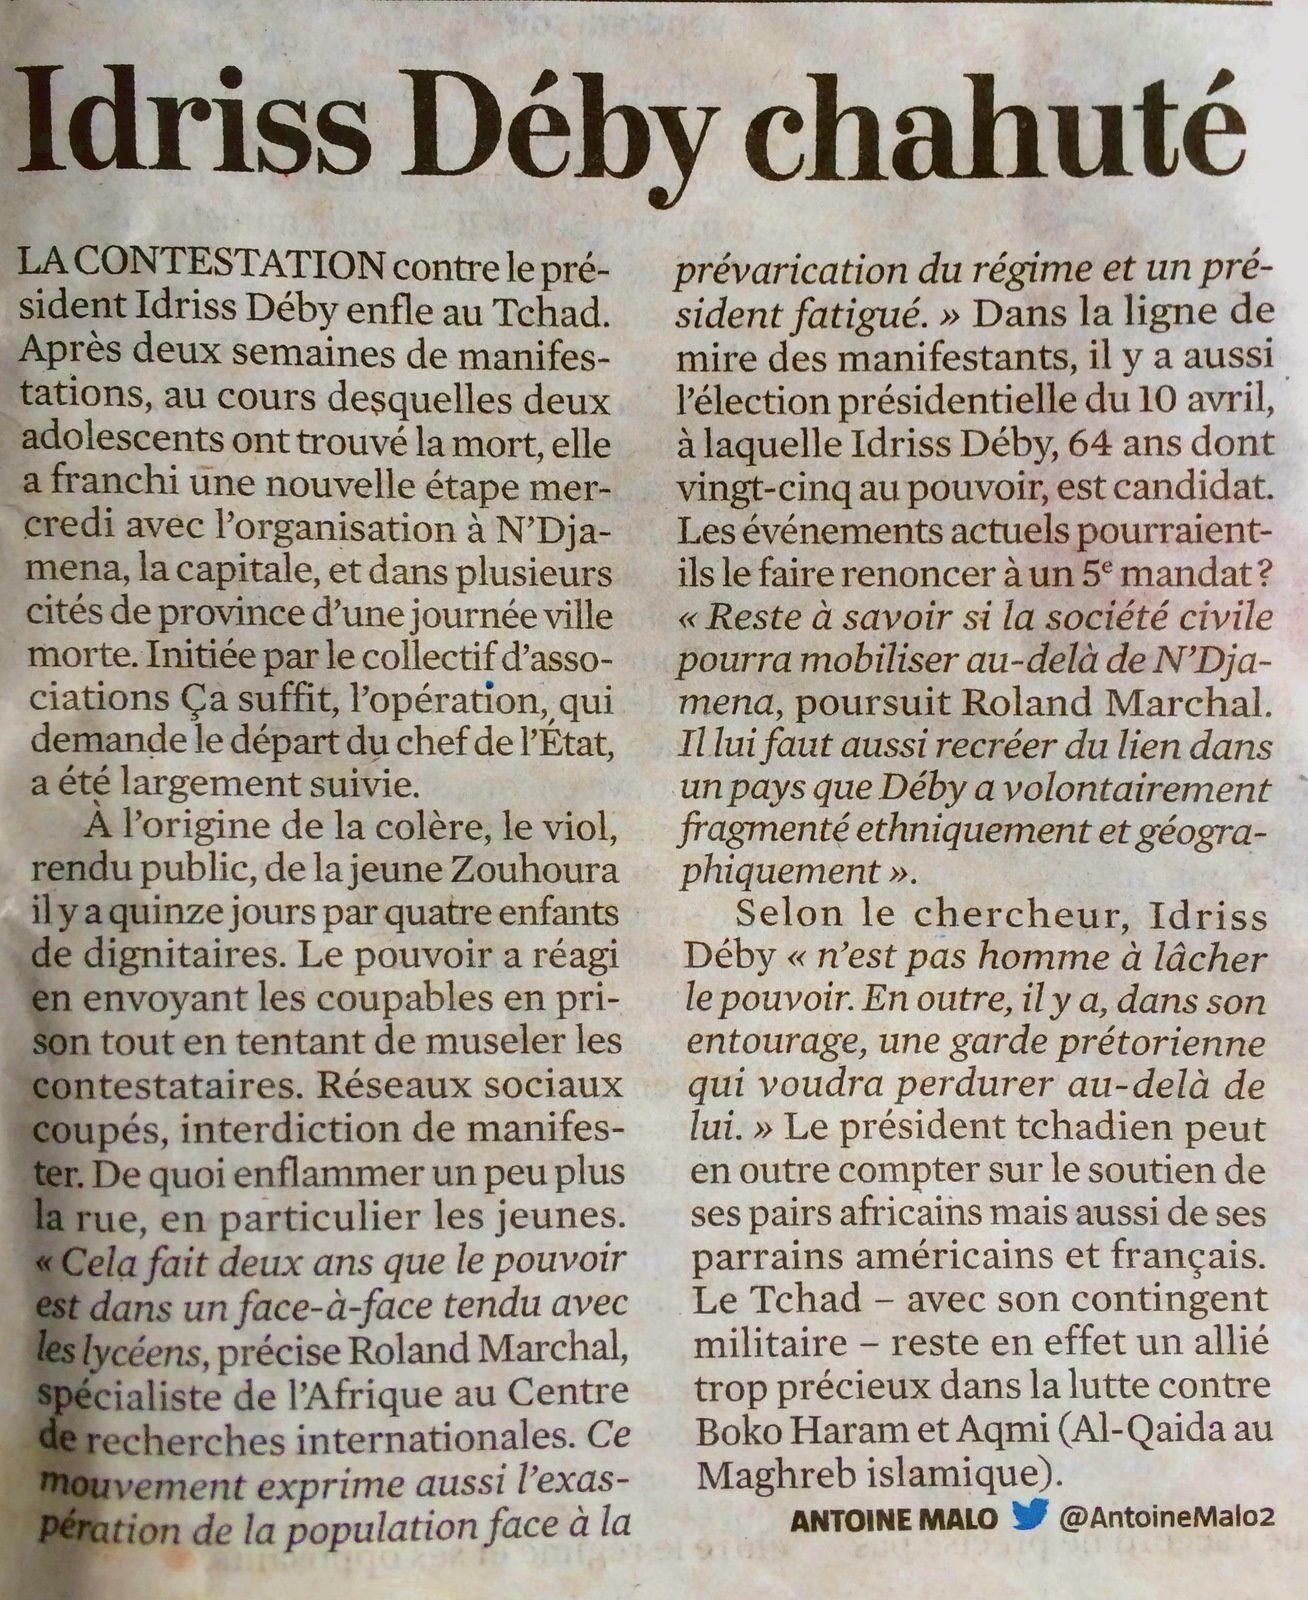 Idriss Deby chahuté au Tchad